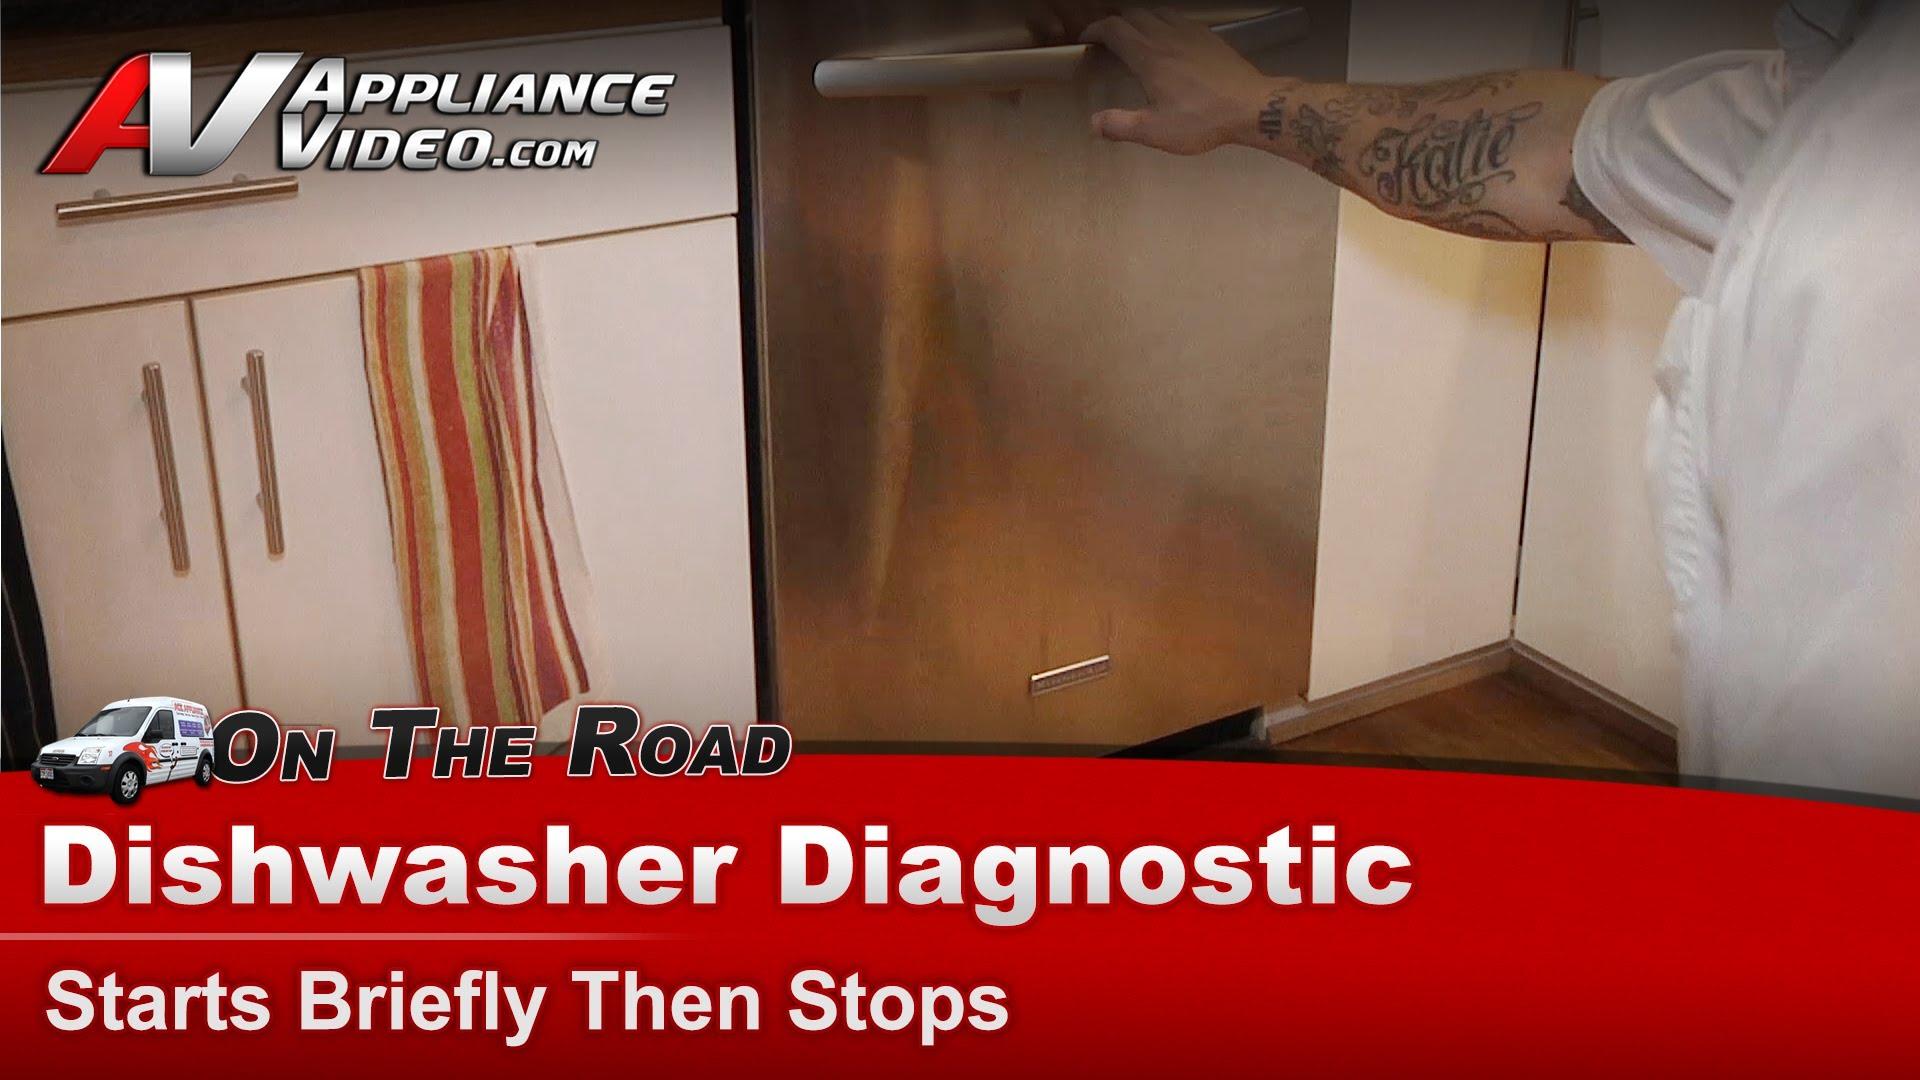 Kitchenaid Kudc03fvss4 Dishwasher Diagnostic Starts Briefly Then